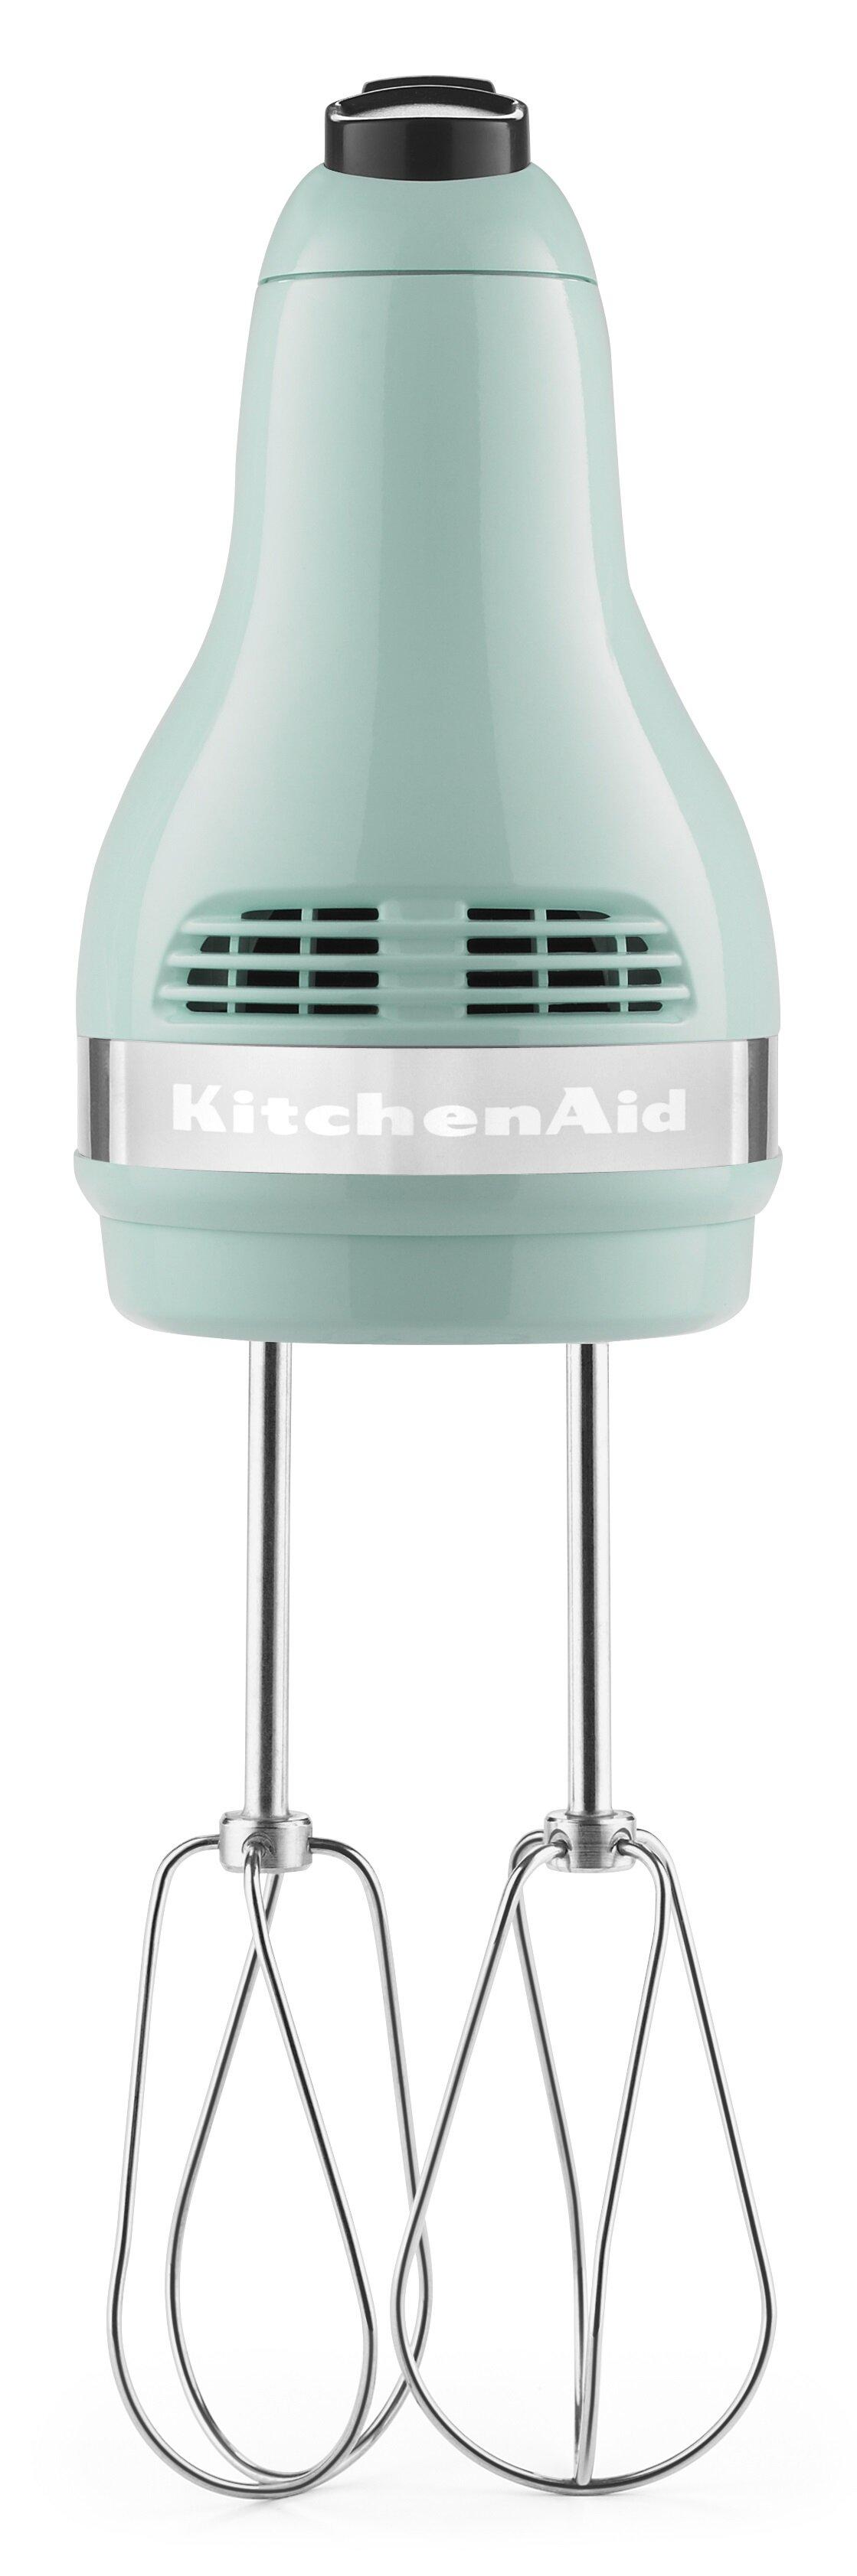 Marvelous Kitchenaid Ultra Power 5 Speed Hand Mixer Download Free Architecture Designs Ponolprimenicaraguapropertycom